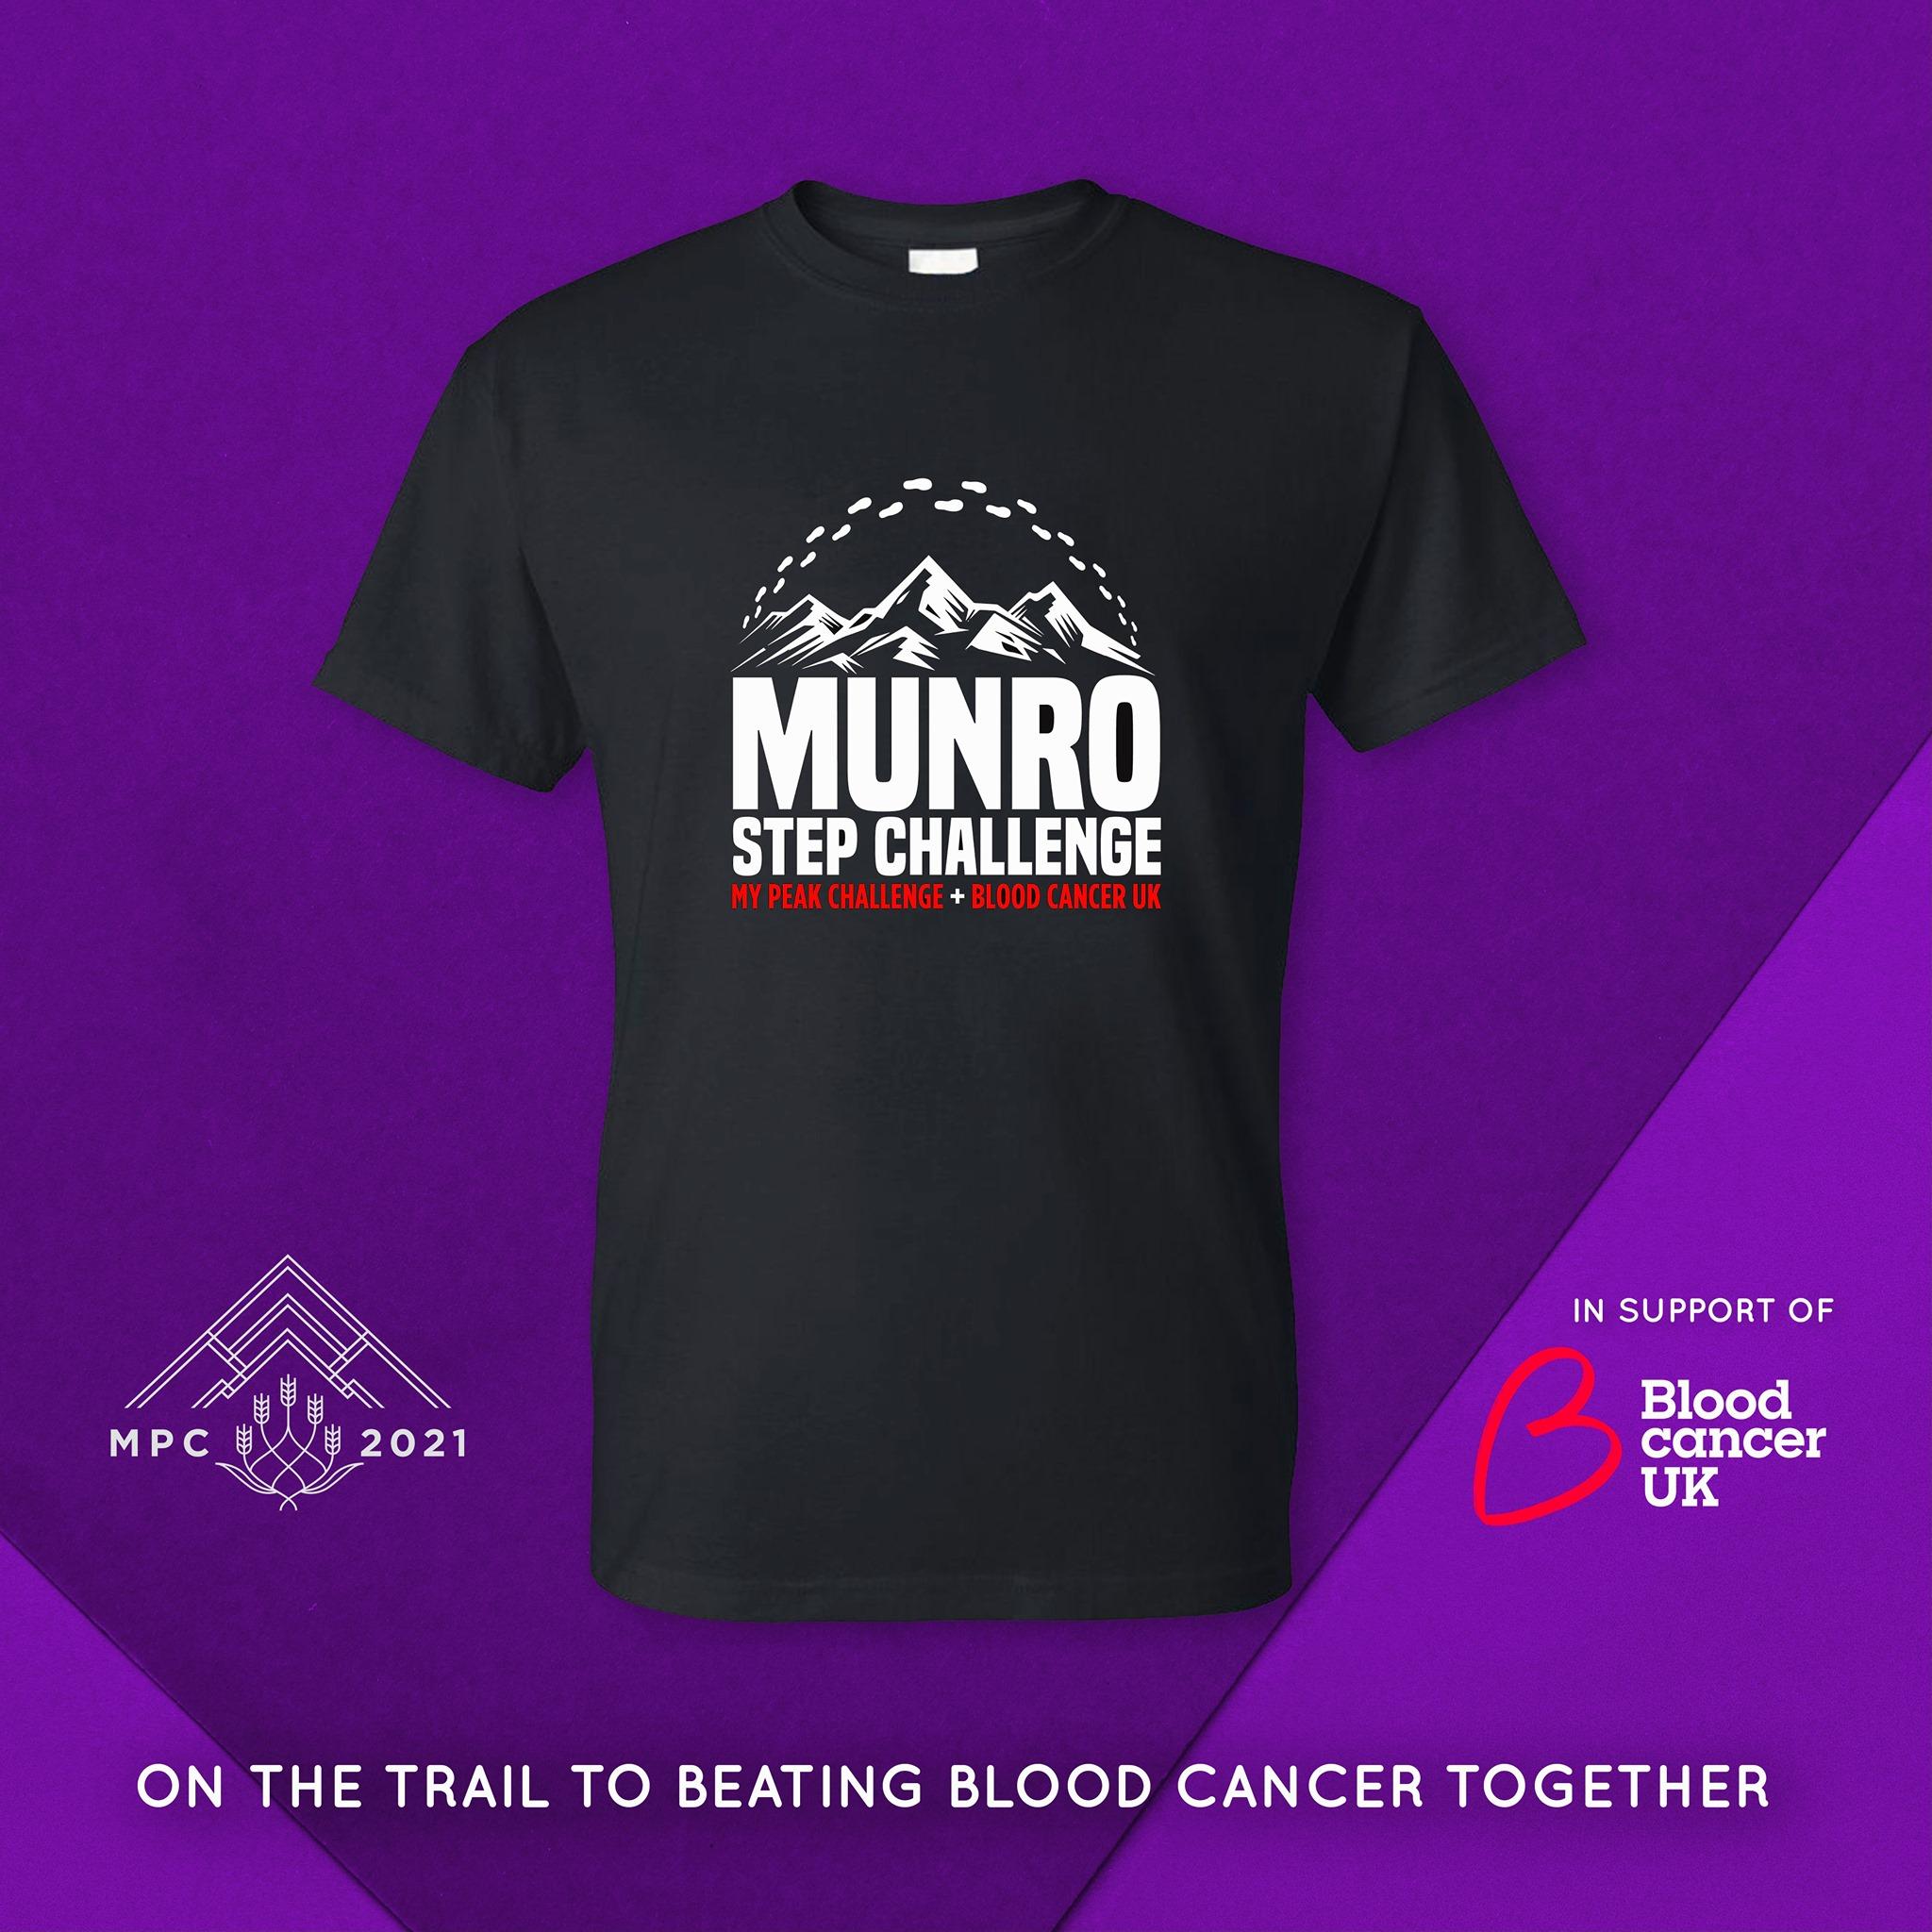 My Peak Challenge - Munro Step Challenge 2021